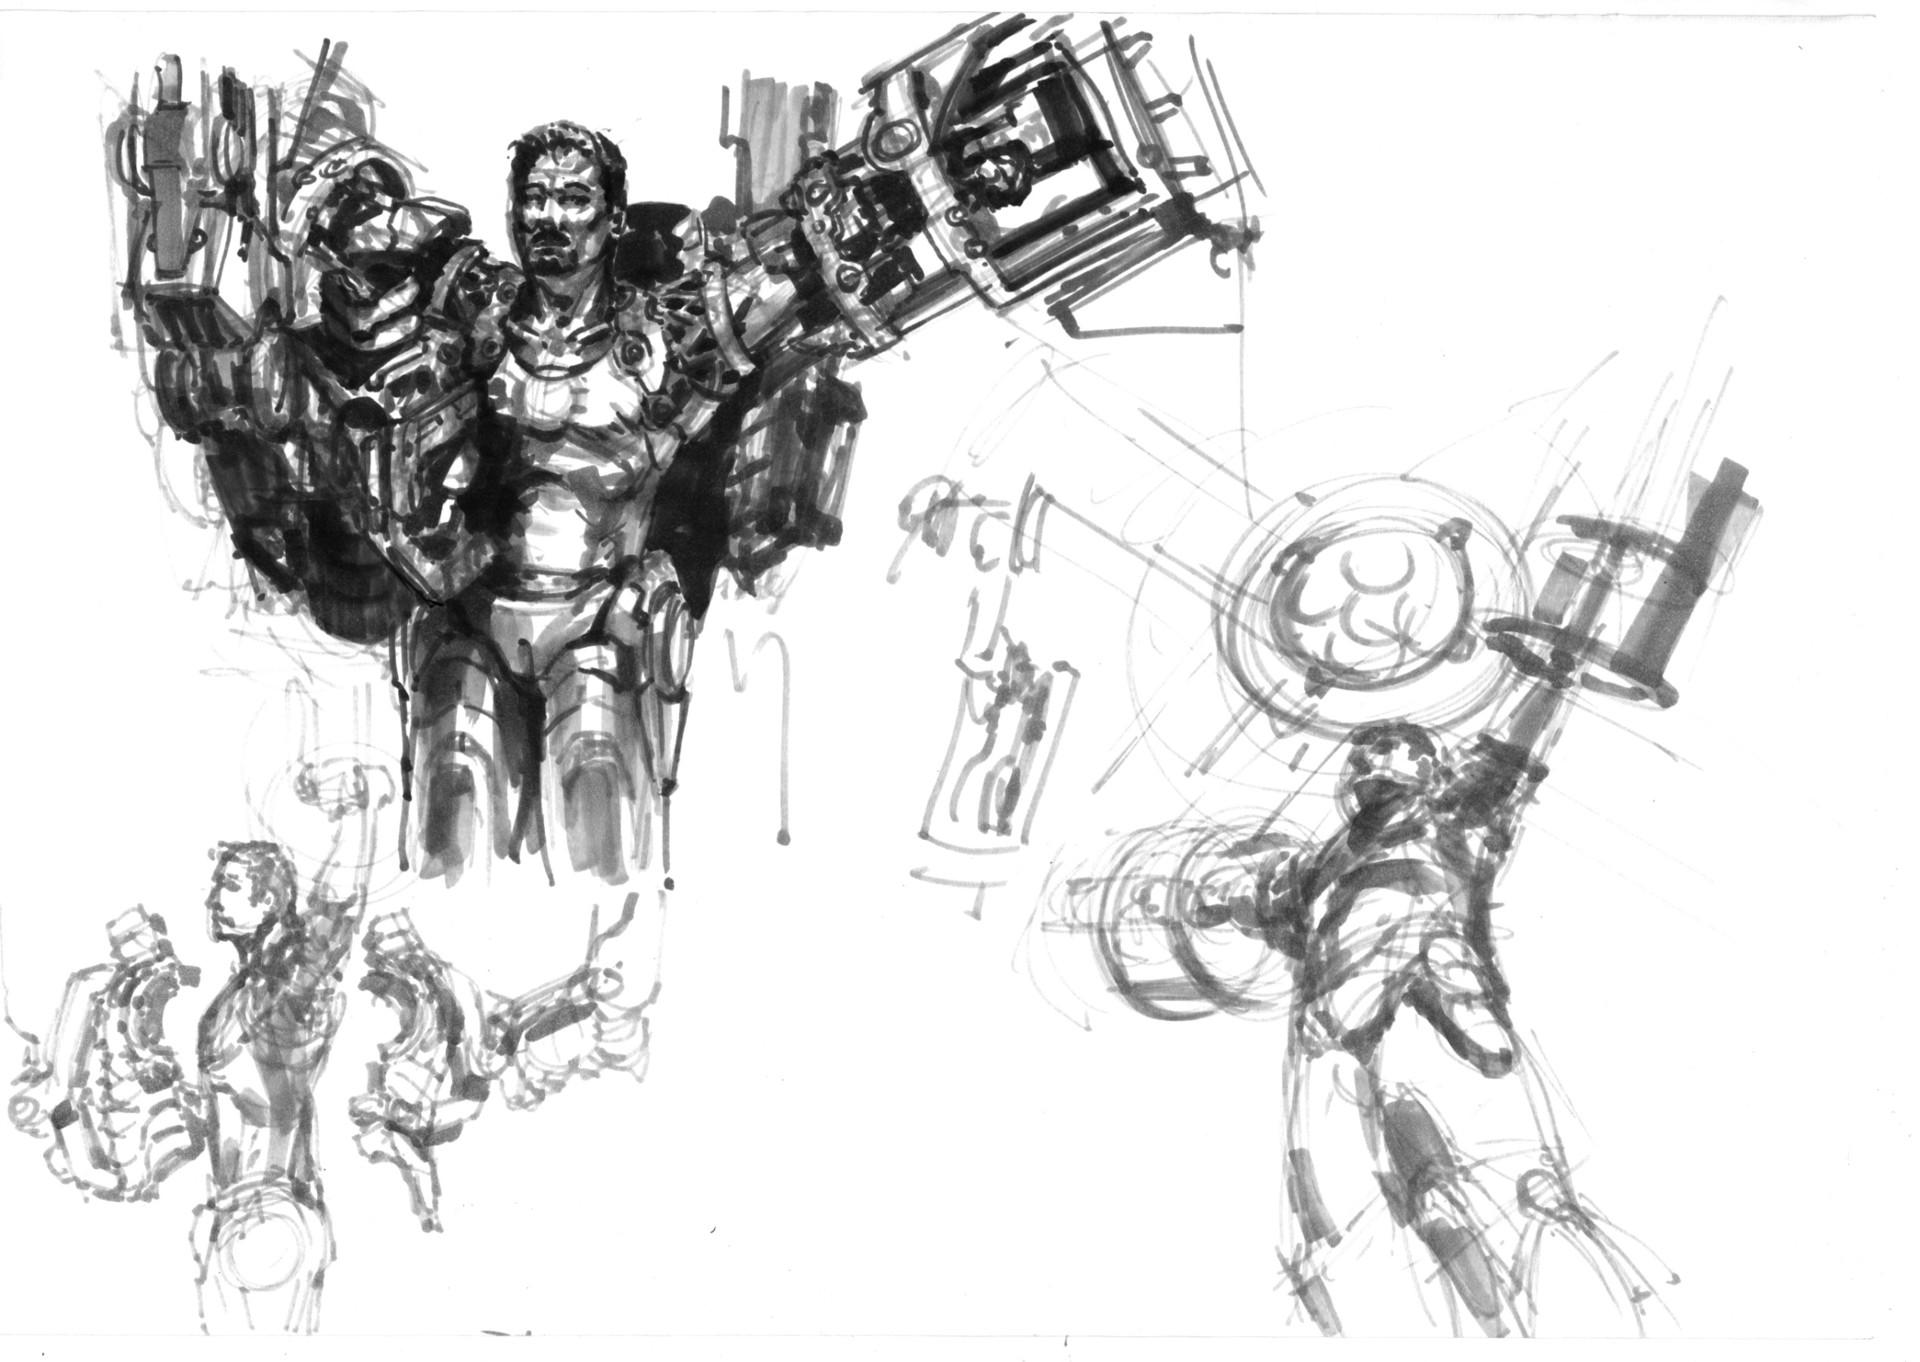 Phil saunders suit up sketch2